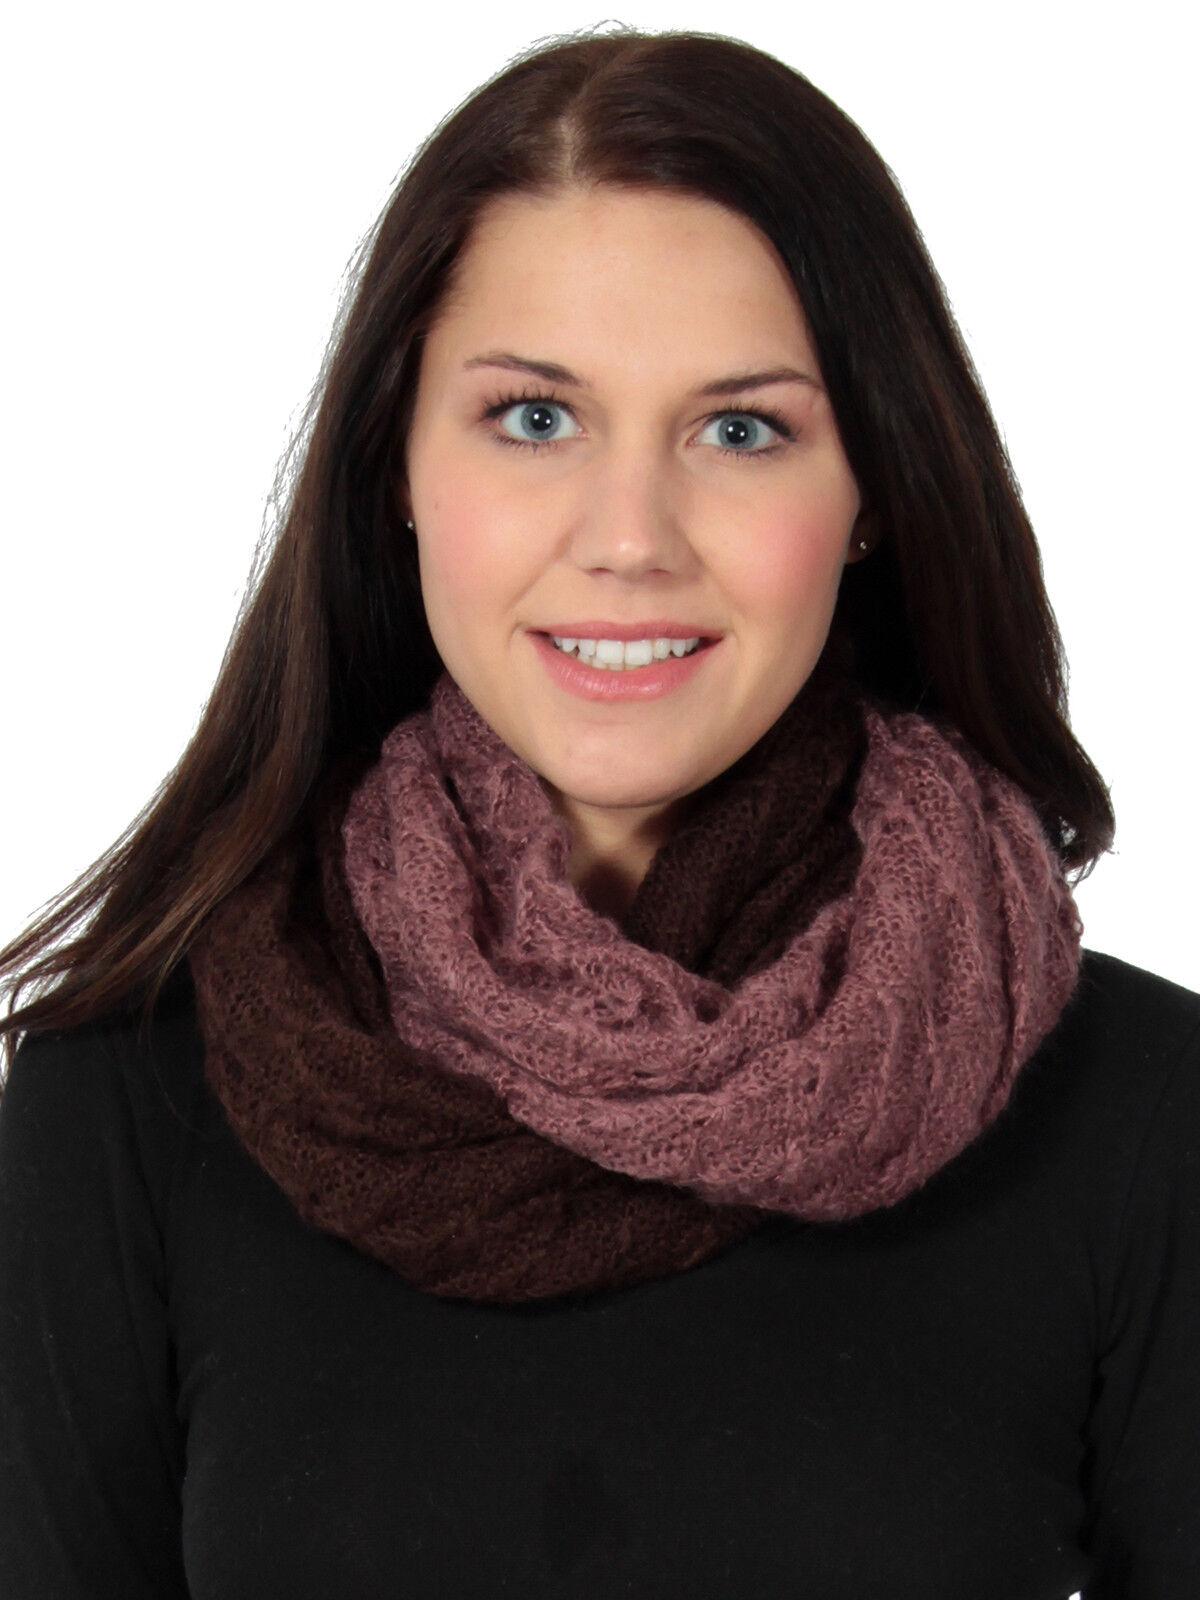 New Women Fashion Light Weight Infinity Warp Cowl Scarf Knit